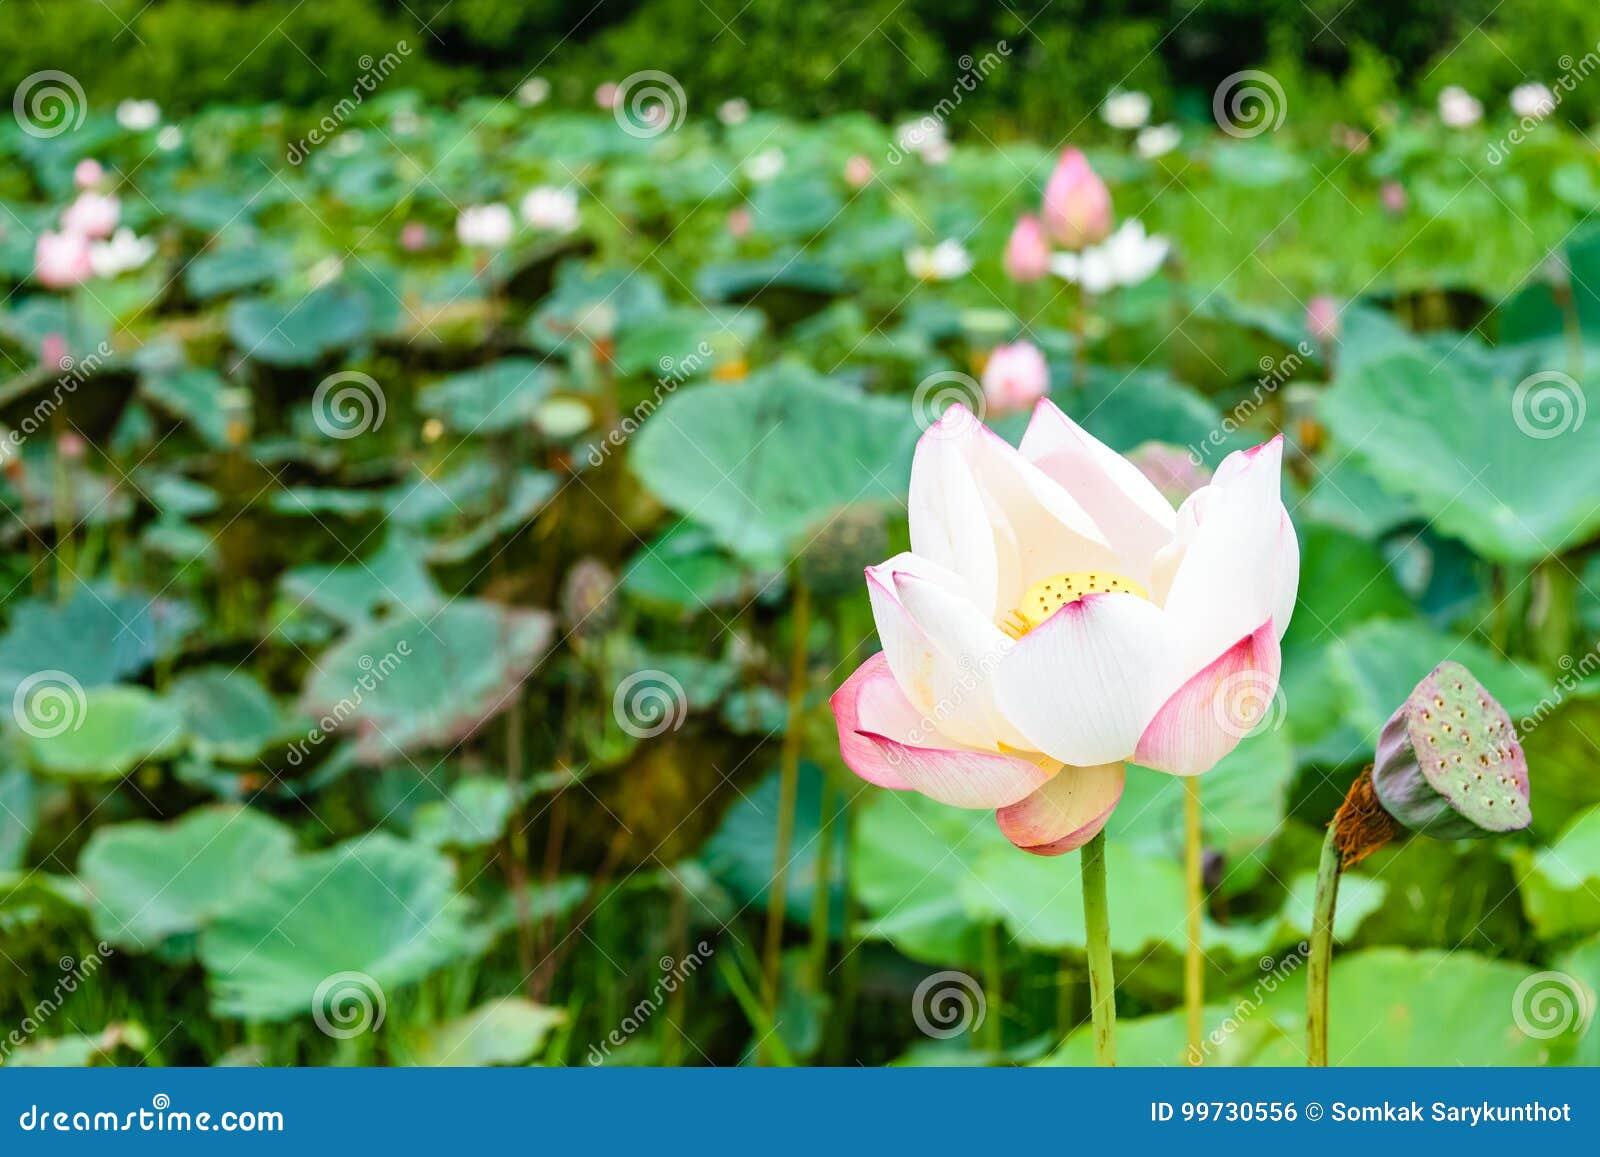 Beautiful lotus flower stock photo image of lotus oriental 99730556 download beautiful lotus flower stock photo image of lotus oriental 99730556 izmirmasajfo